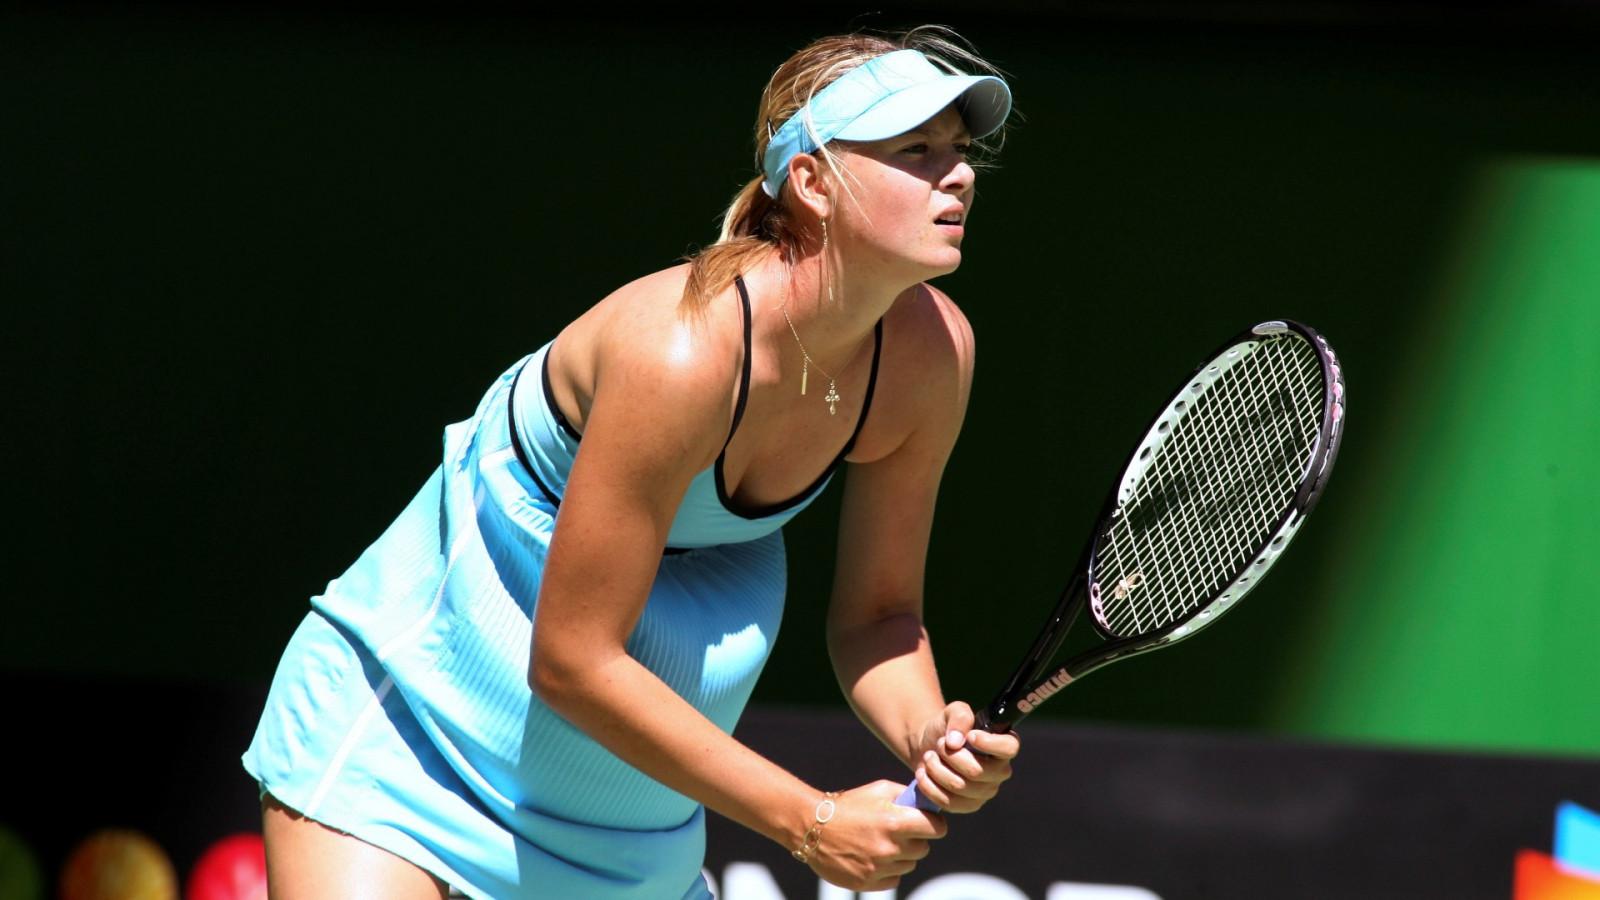 Woman Tennis Player 1080p Hd Wallpaper Sports: Wallpaper : Russian Women, Maria Sharapova, Tournament